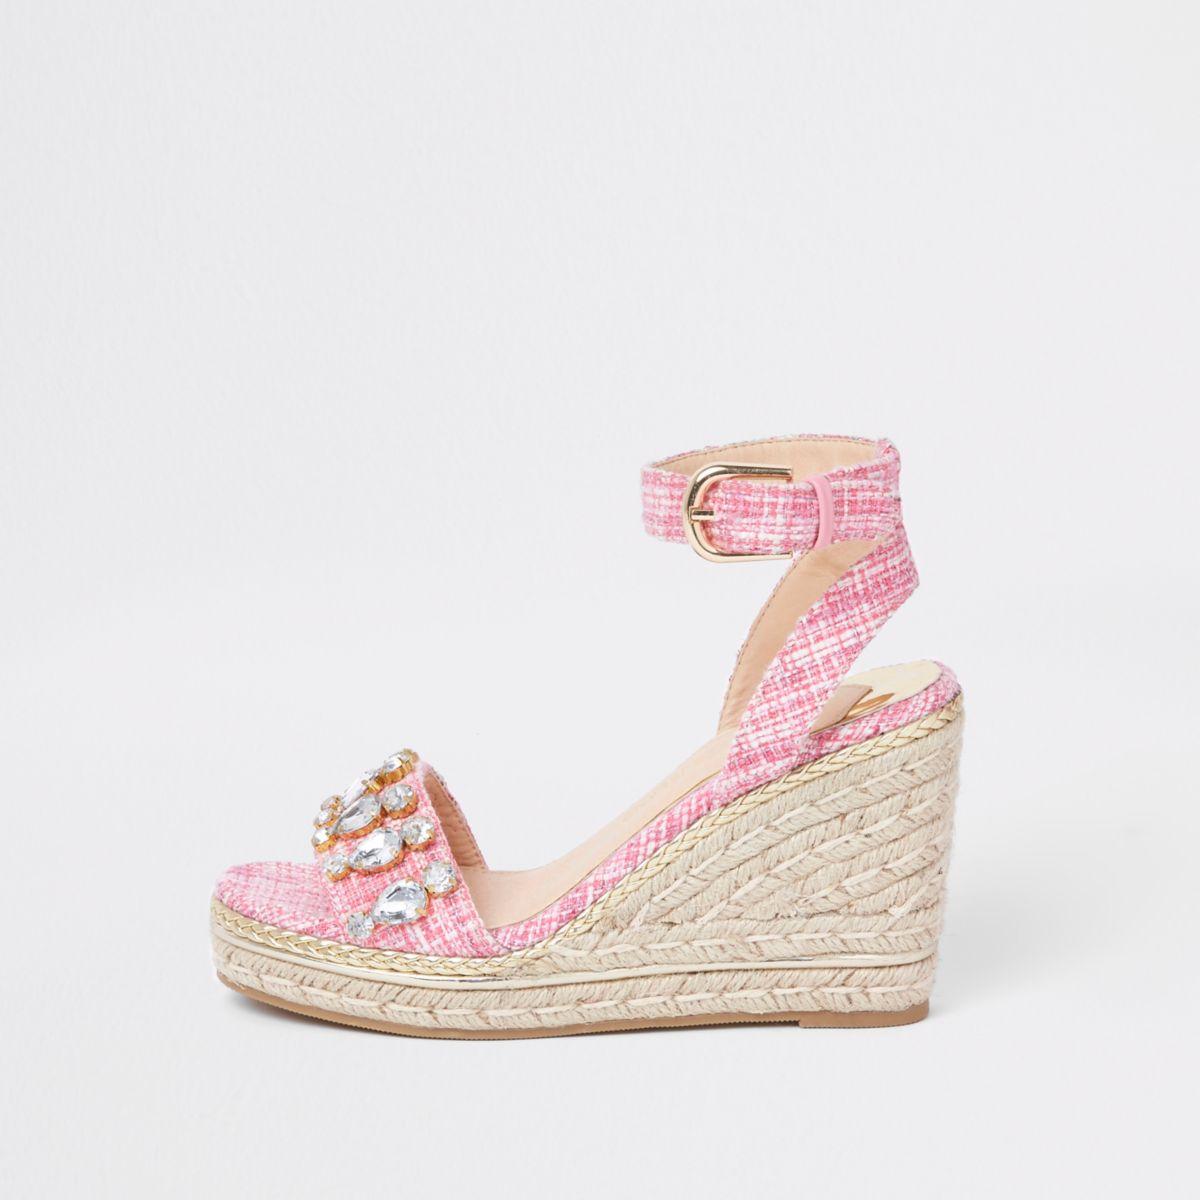 Pink tweed embellished espadrille wedges